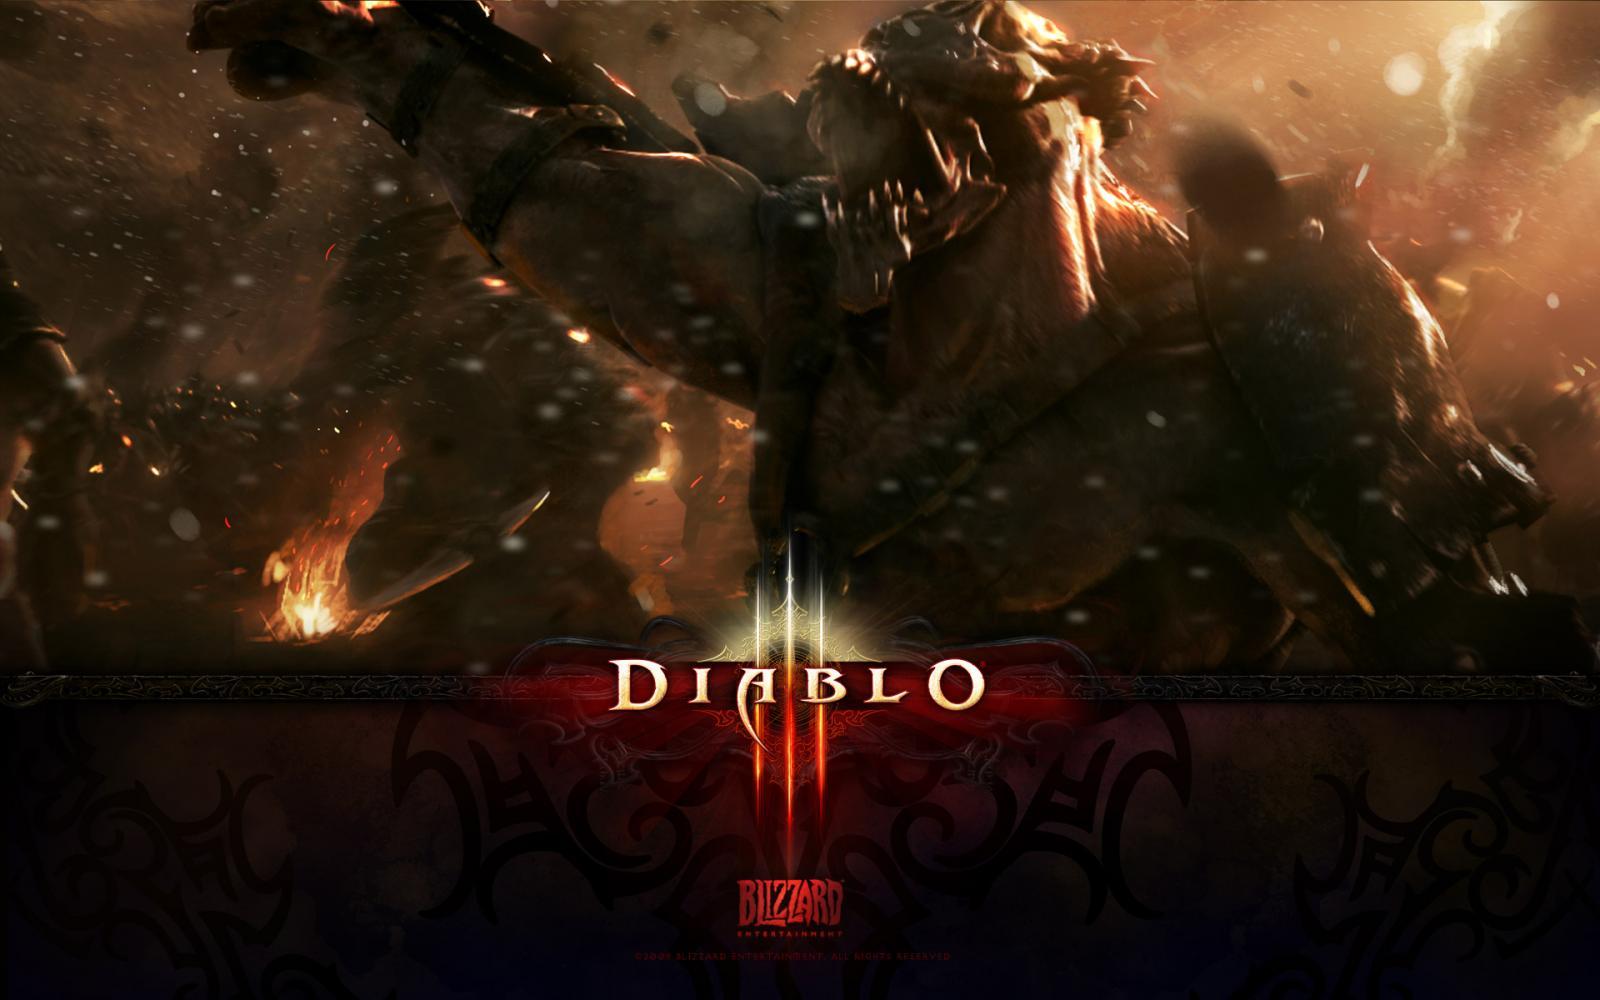 Wallpaper Diablo 3 Armee Jeux video